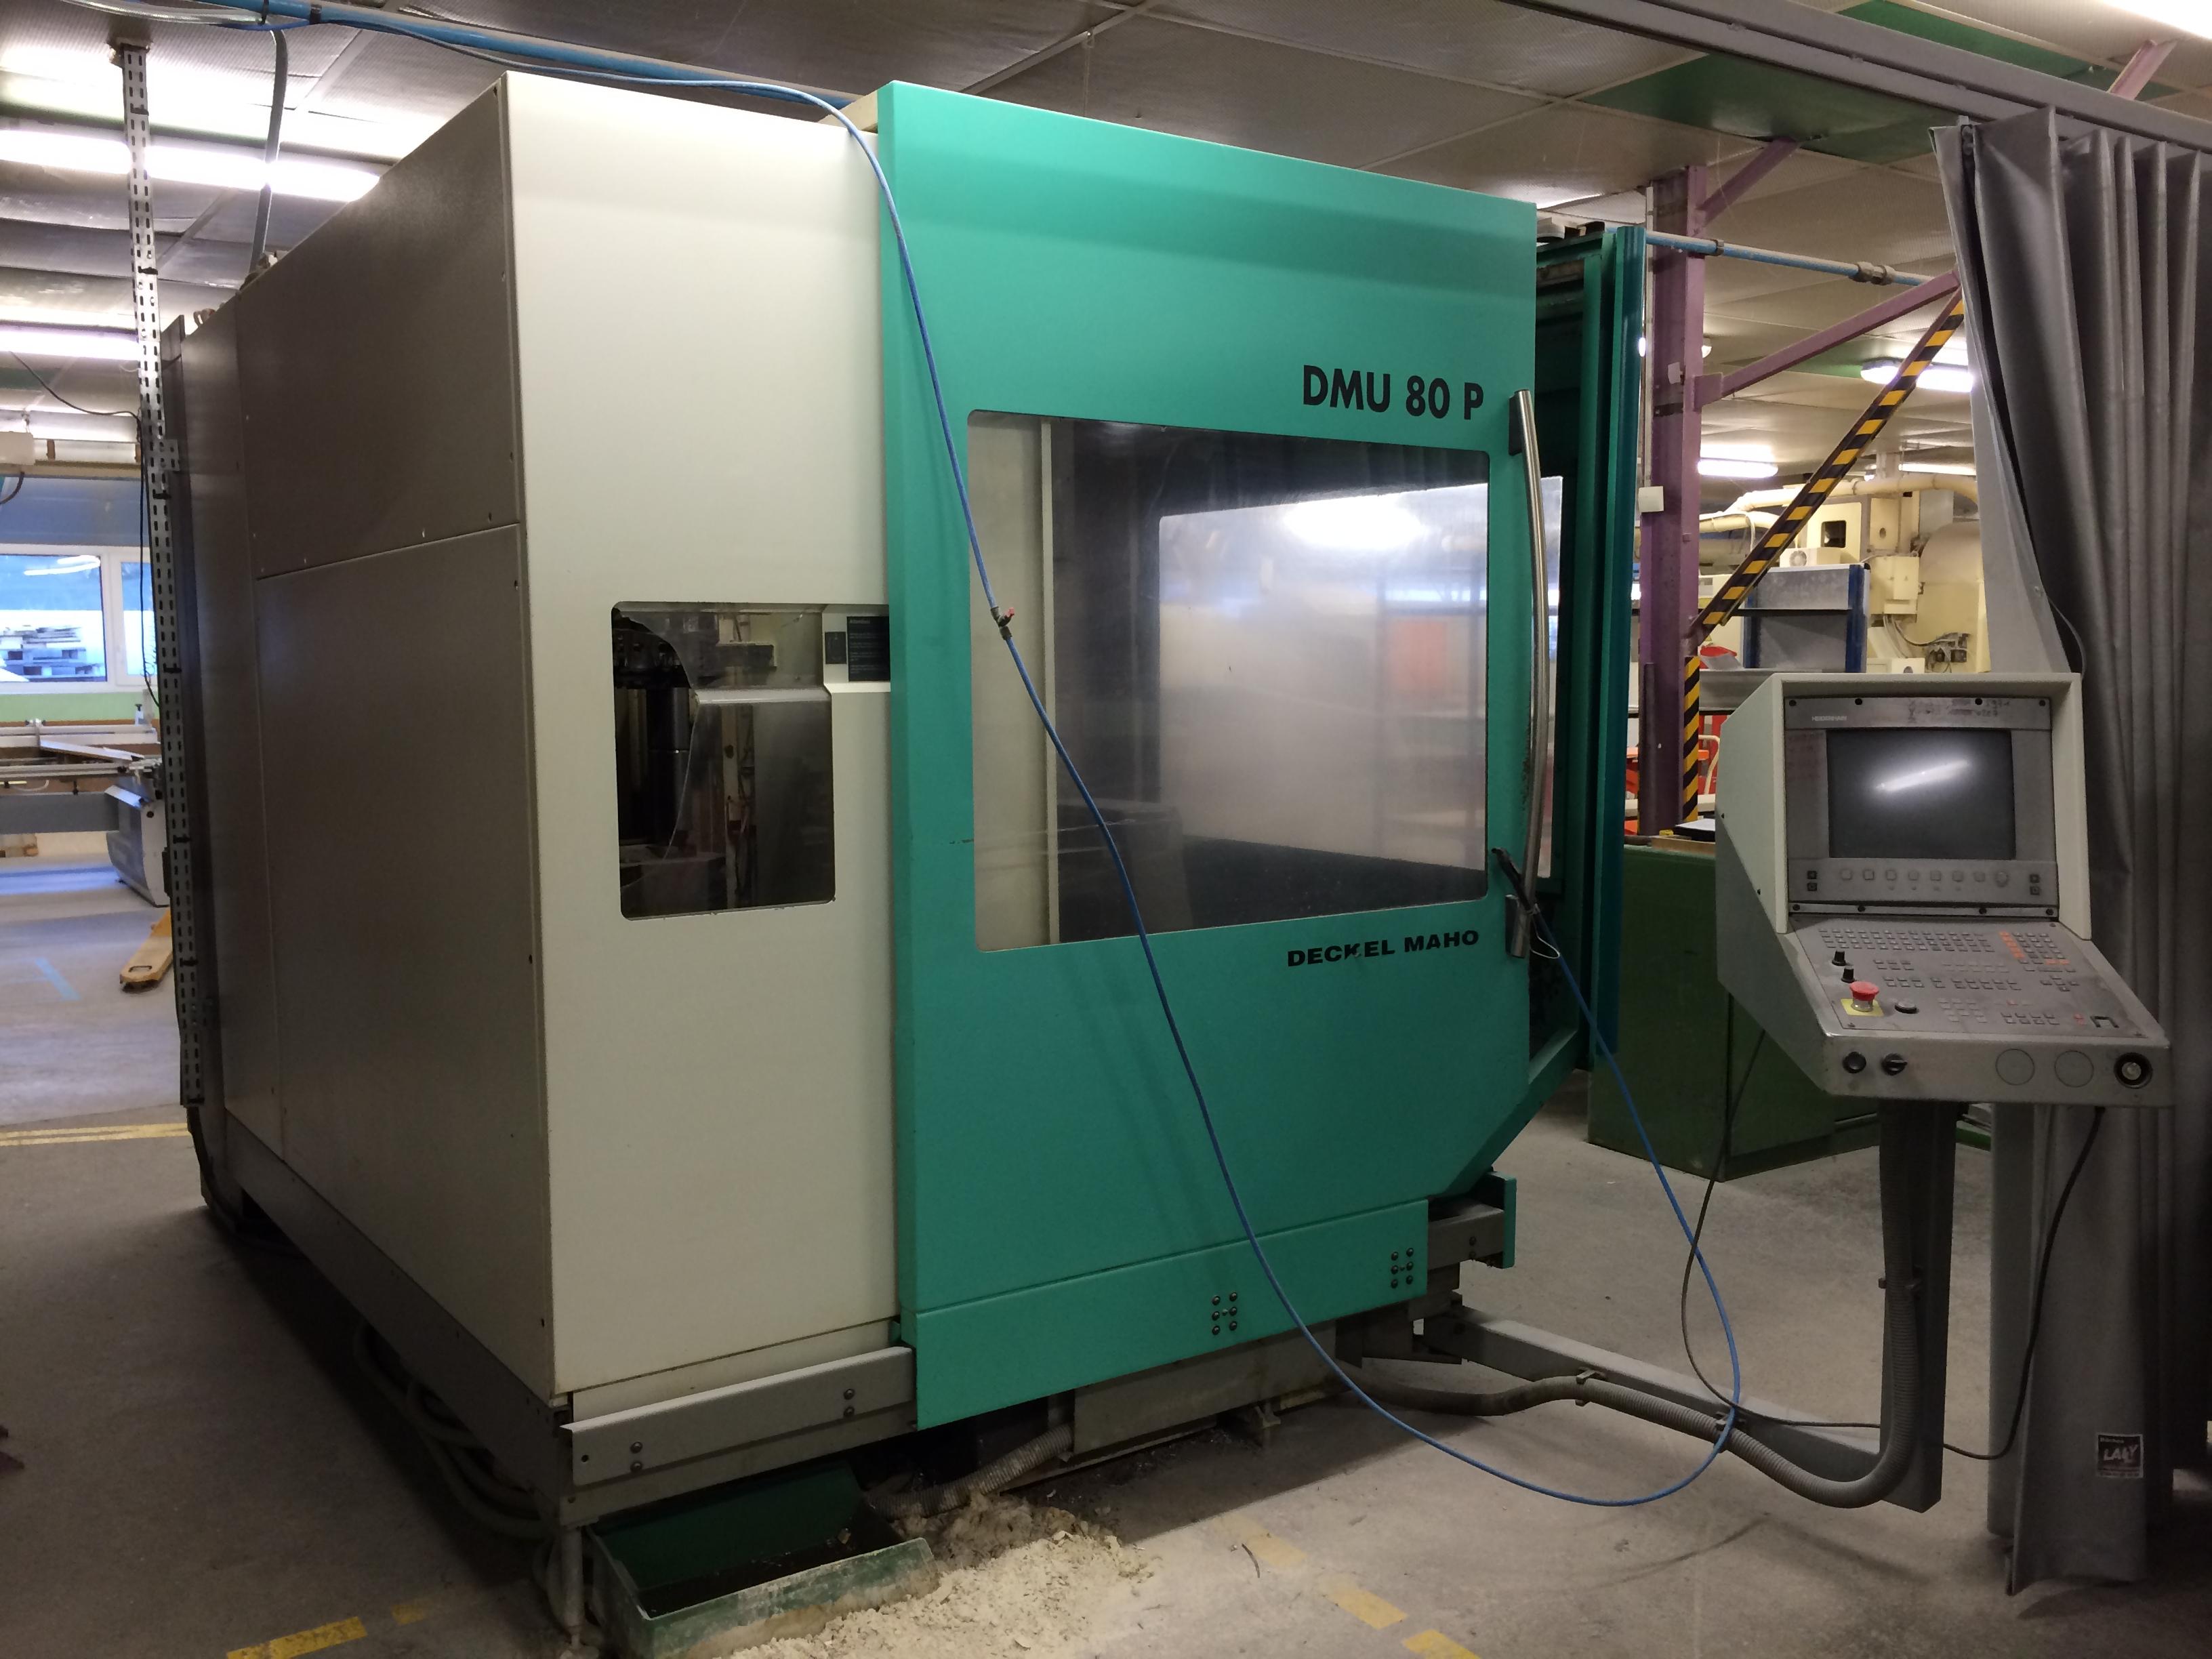 Dmg deckel maho dmu 80p 5 axis machining centre exapro for Dmg deckel maho